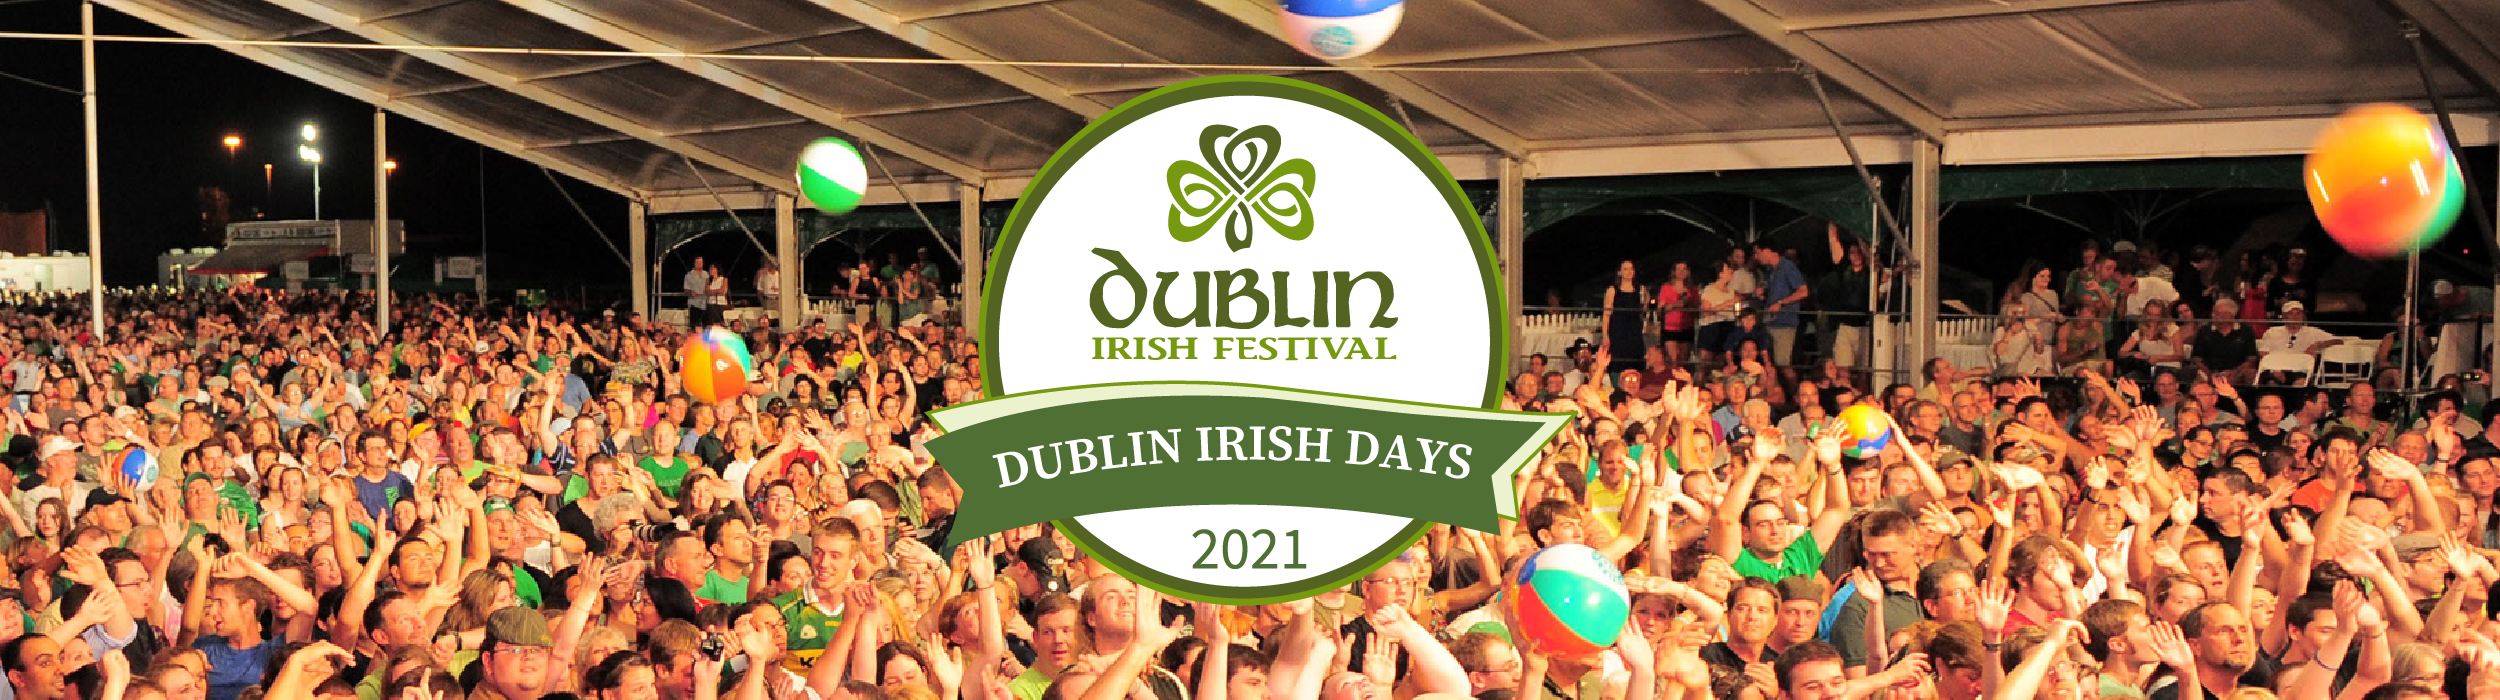 Dublin Irish Days Home Page Image